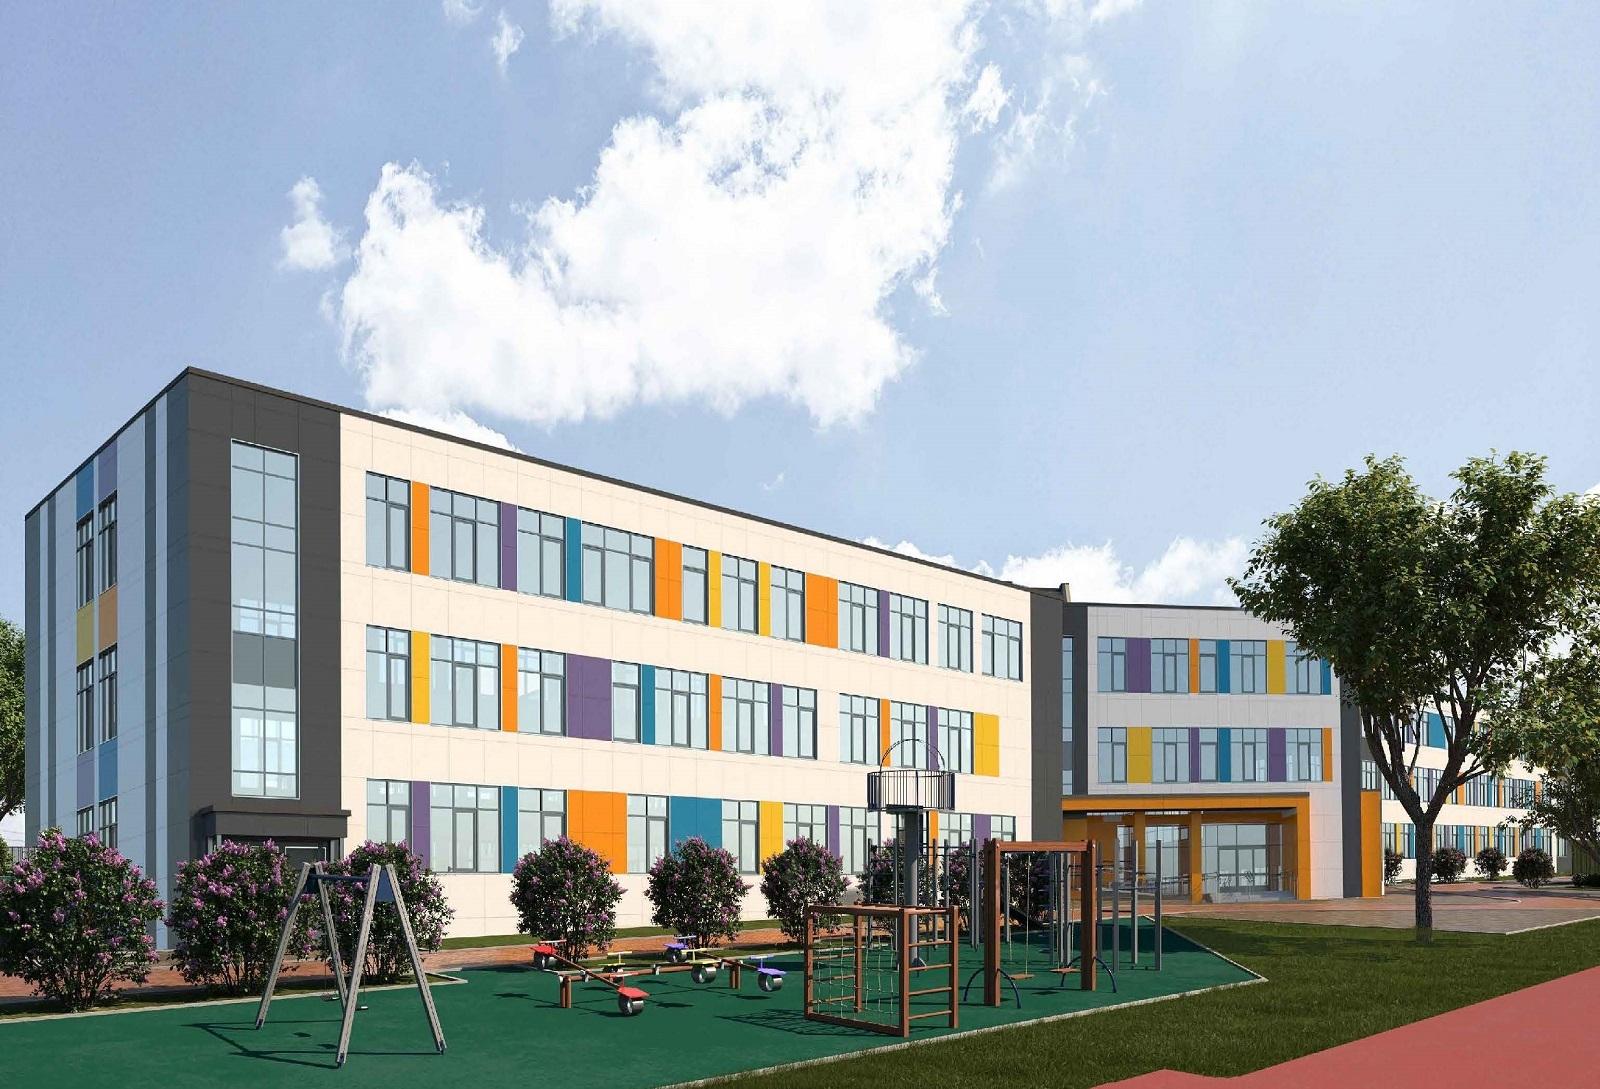 На юго-востоке Москвы возведут школу на 1150 мест